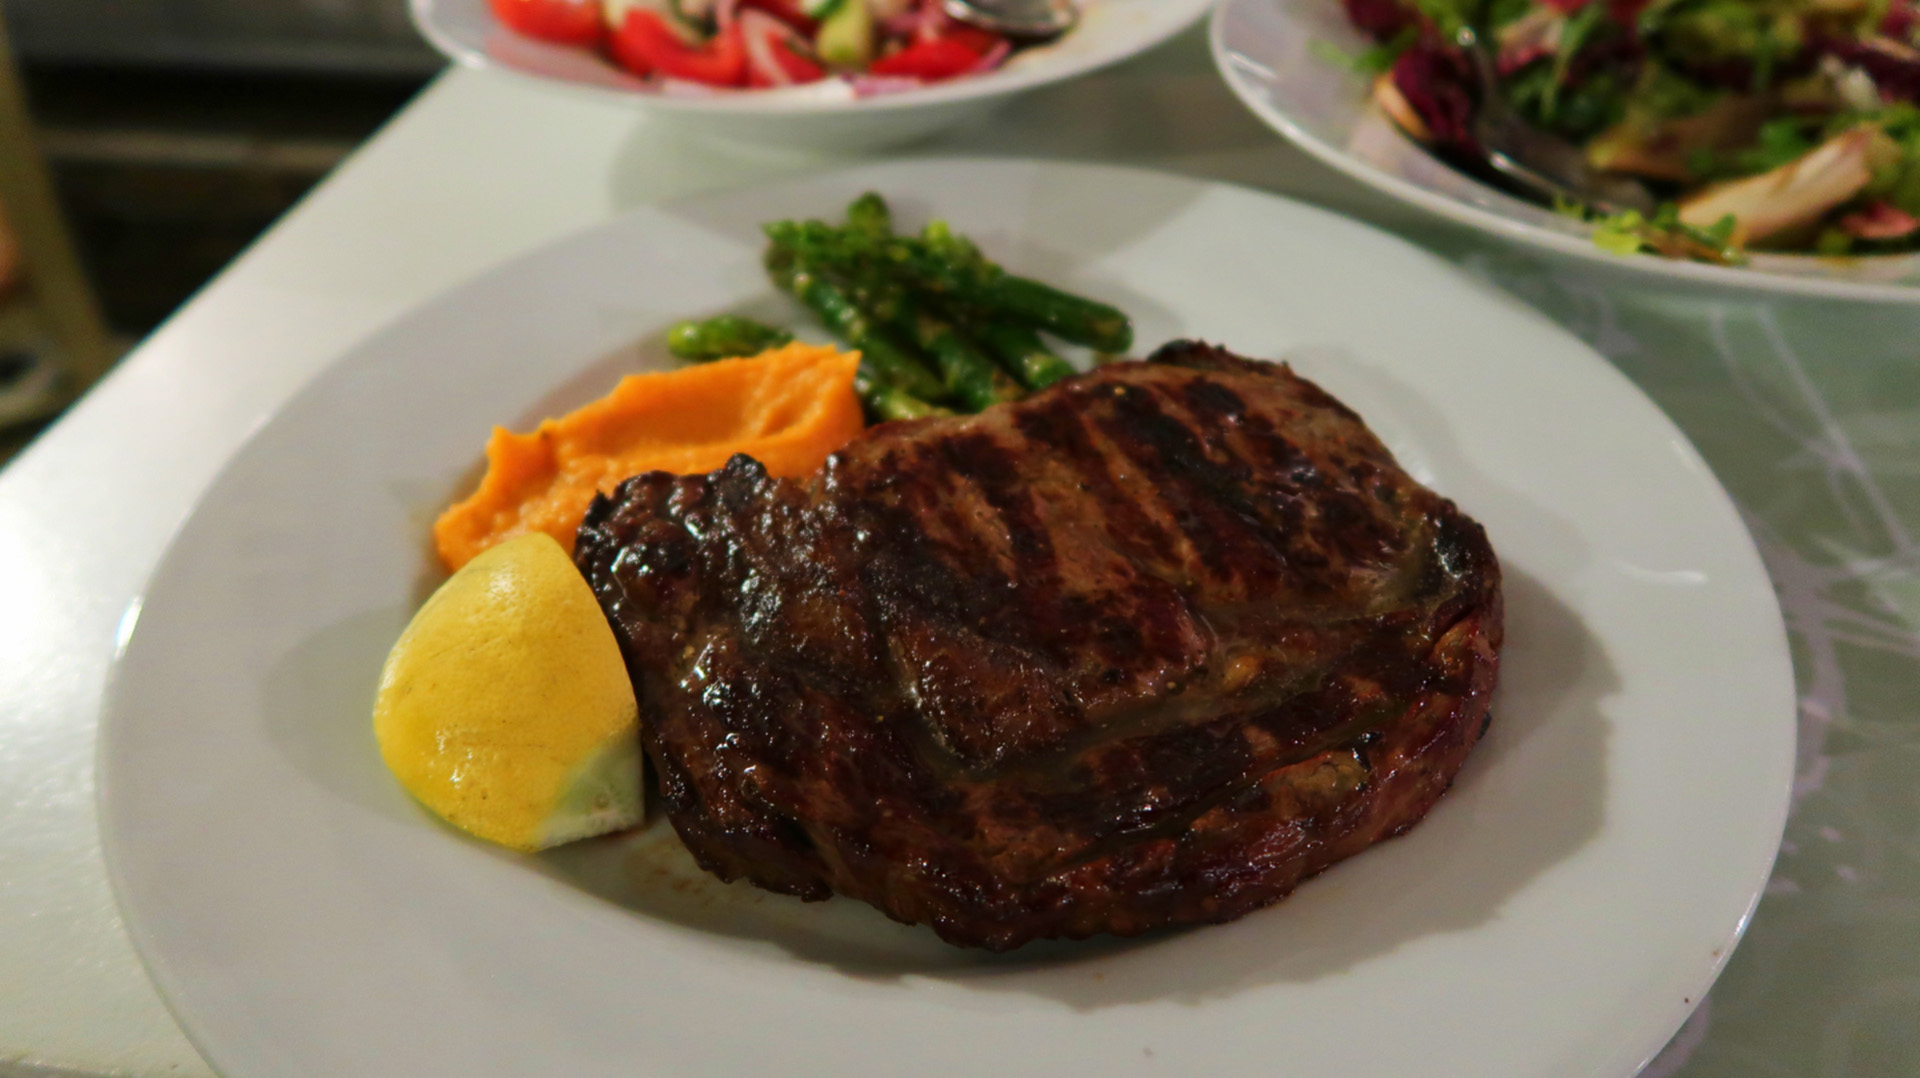 Sway the way andros batsi oti kalo ribb eye steak10